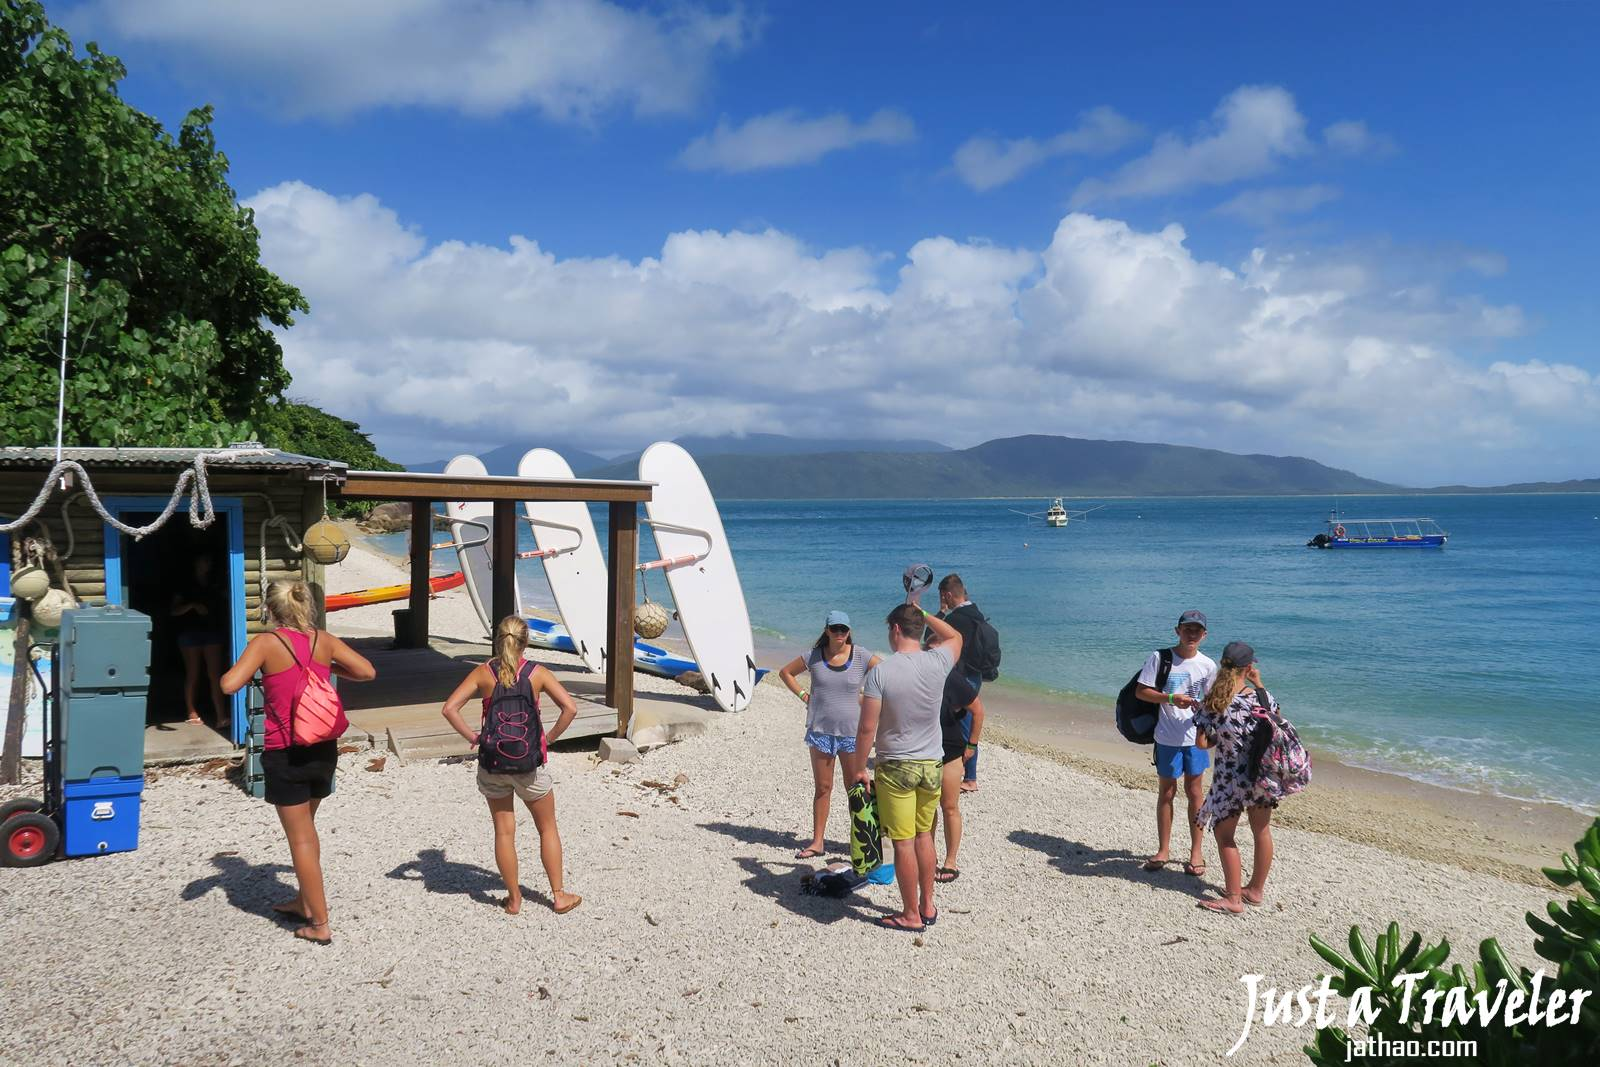 凱恩斯-大堡礁-翡翠島-內堡礁-浮潛-潛水-推薦-旅遊-自由行-澳洲-Carins-Great-Barrier-Reef-Fitzroy-Island-Snorkel-Diving-Travel-Australia